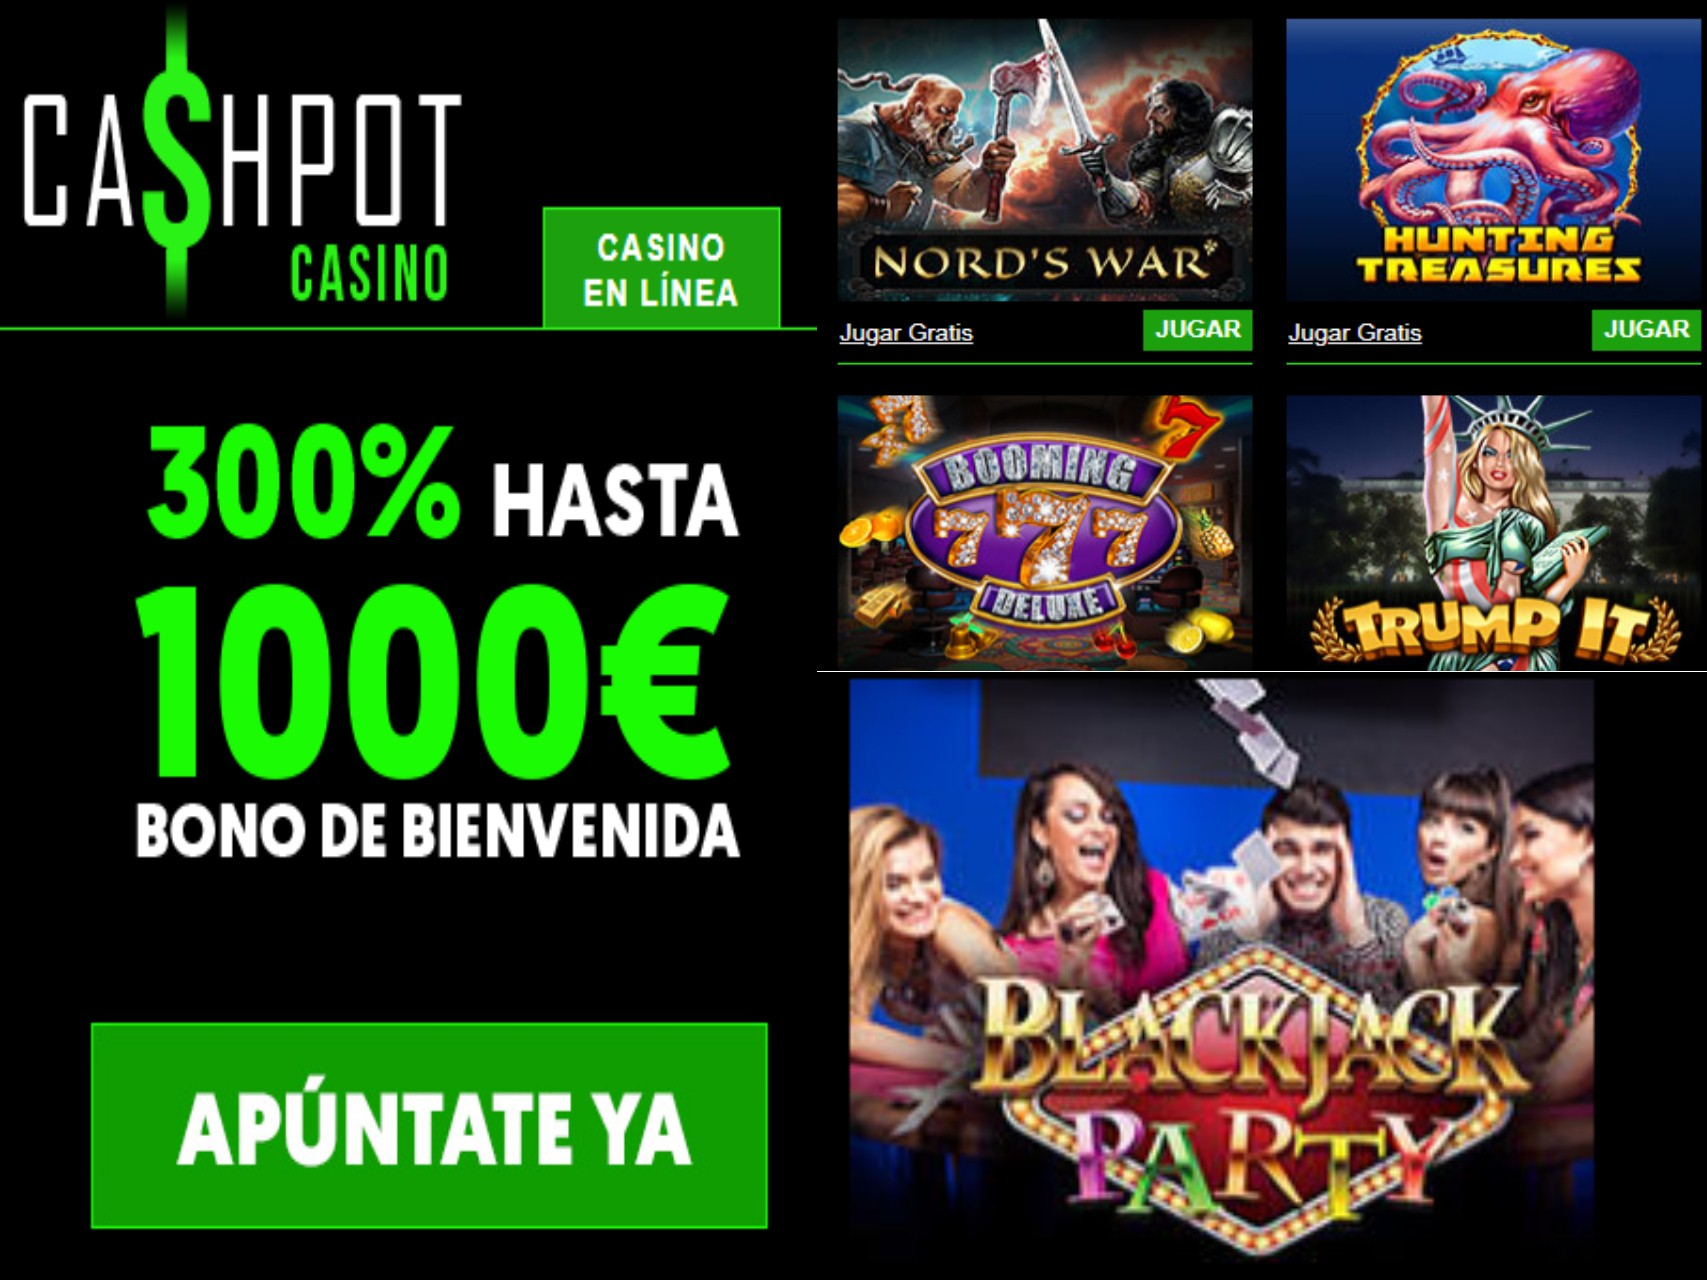 Bono de bienvenida Casino Cashpot hasta por 1000 euros